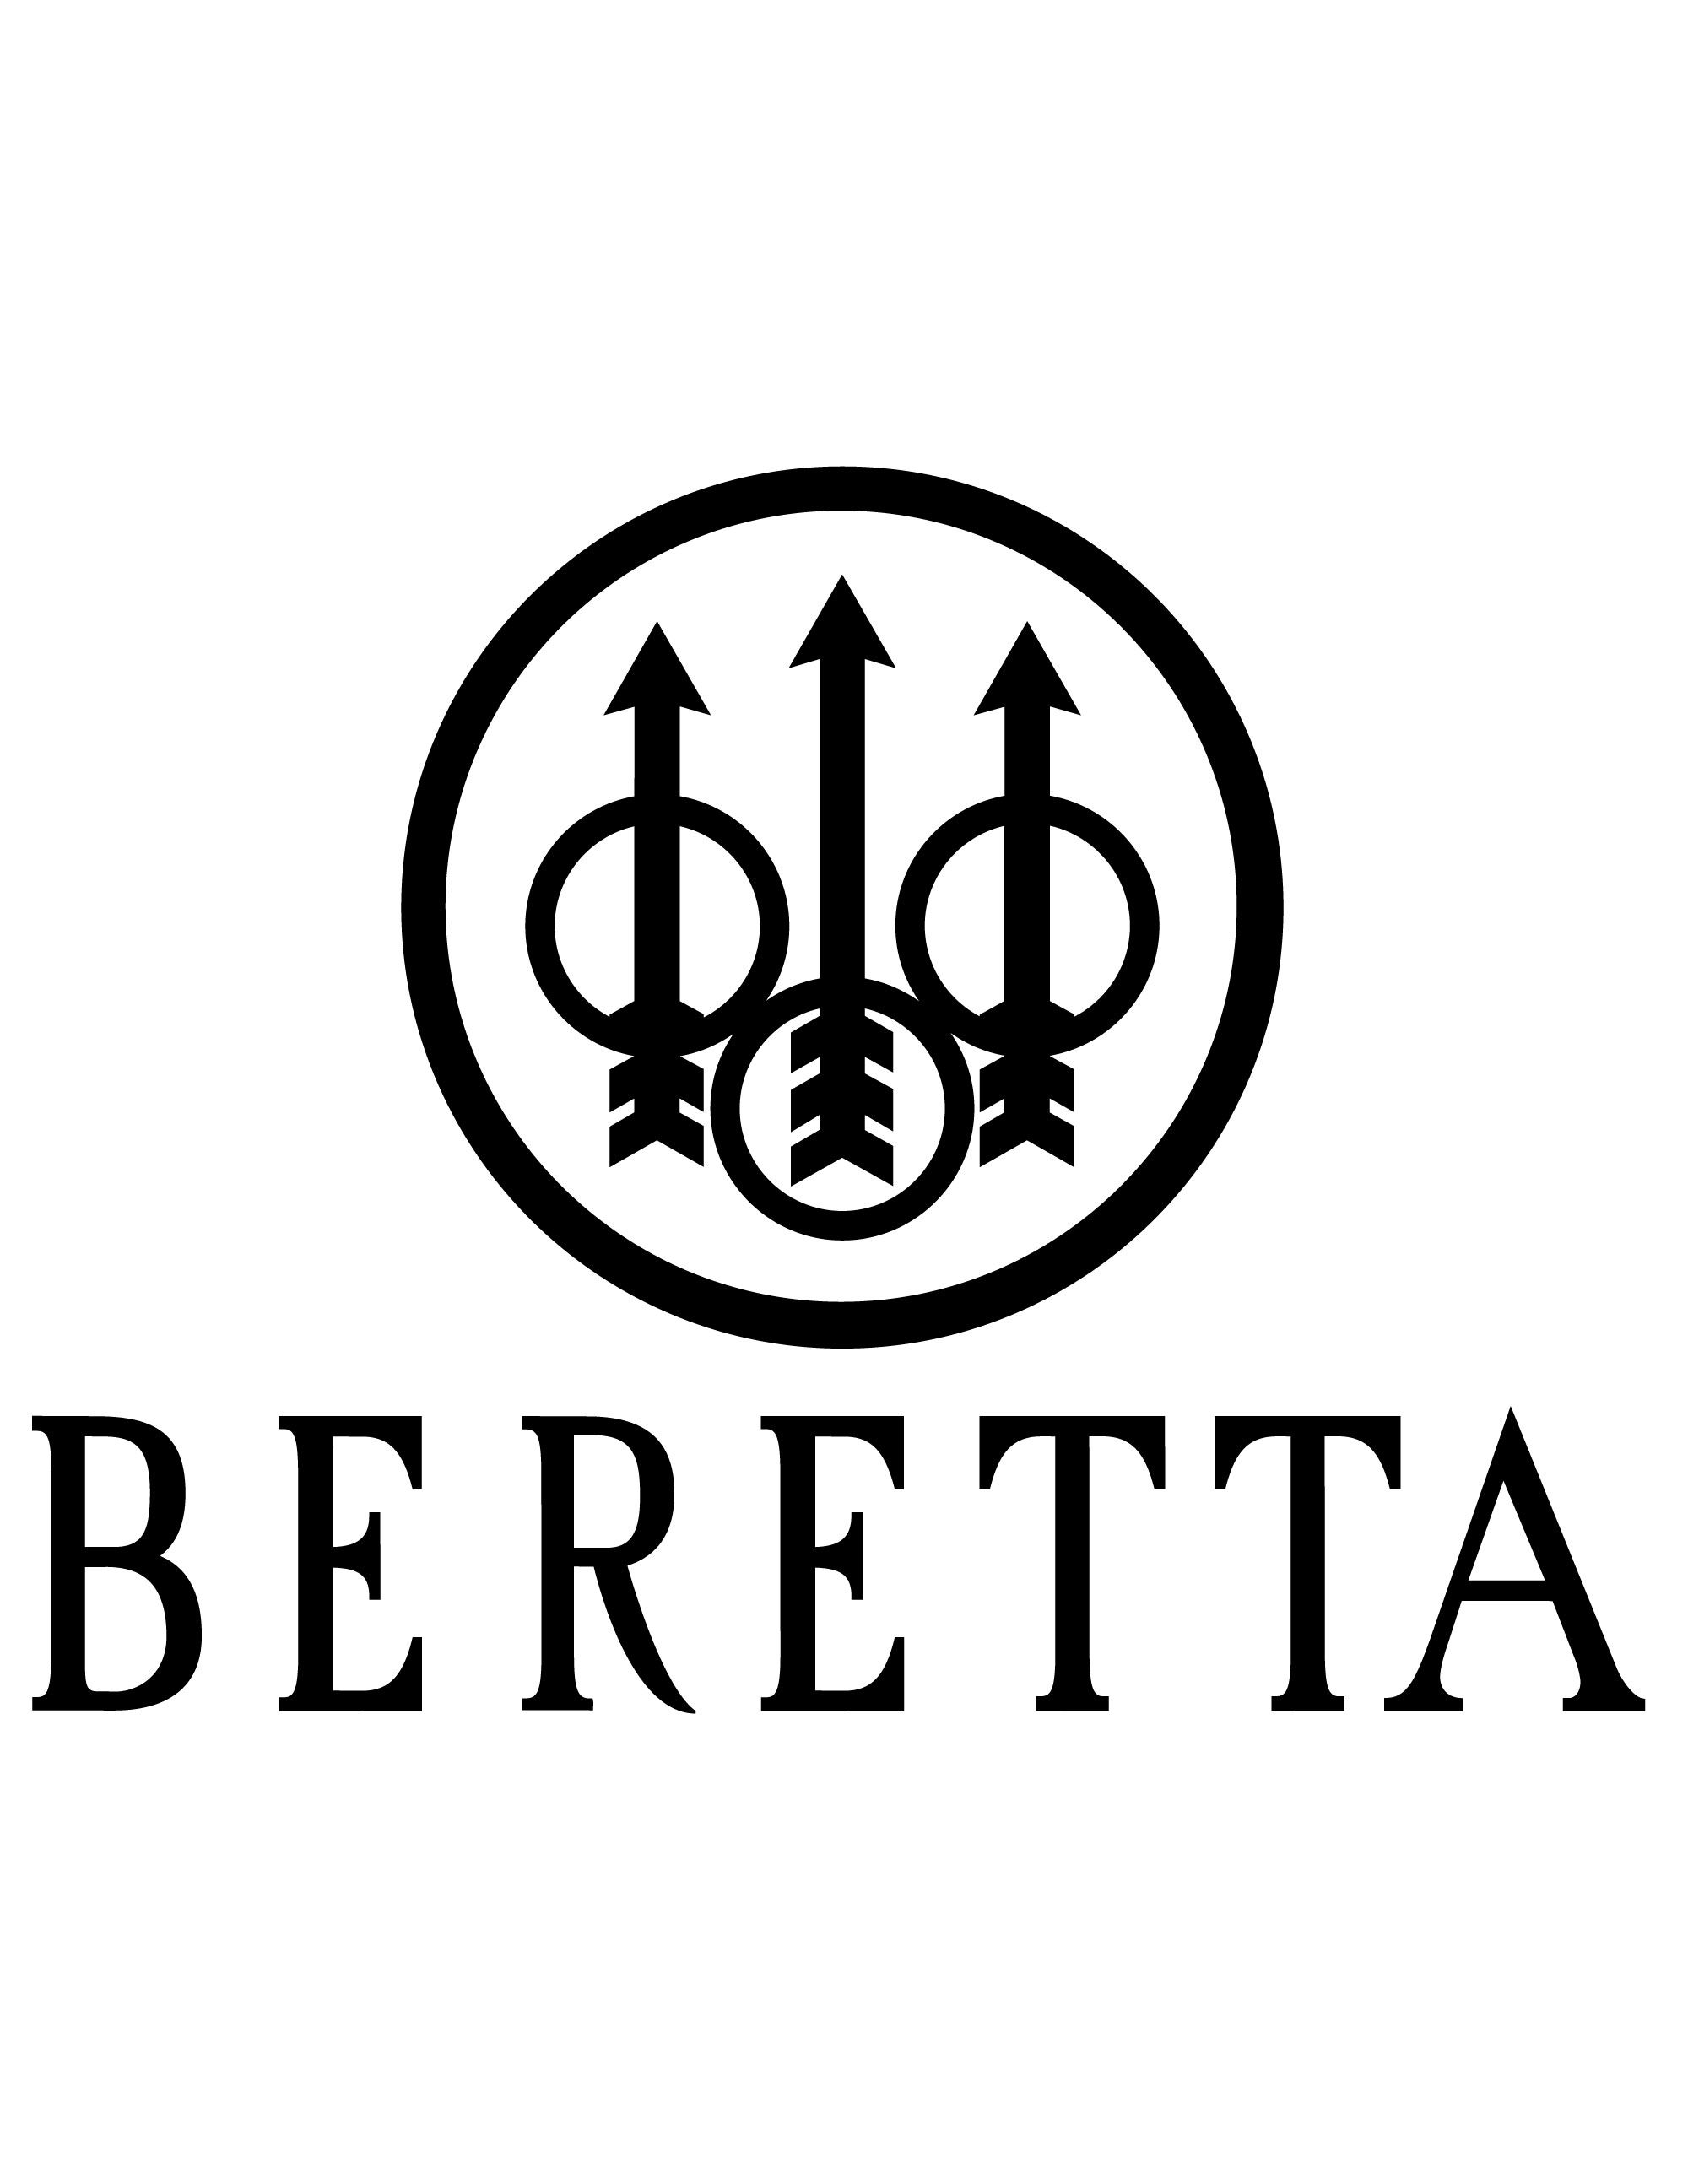 05436f4cf09 Beretta (Firearms manufacturer)